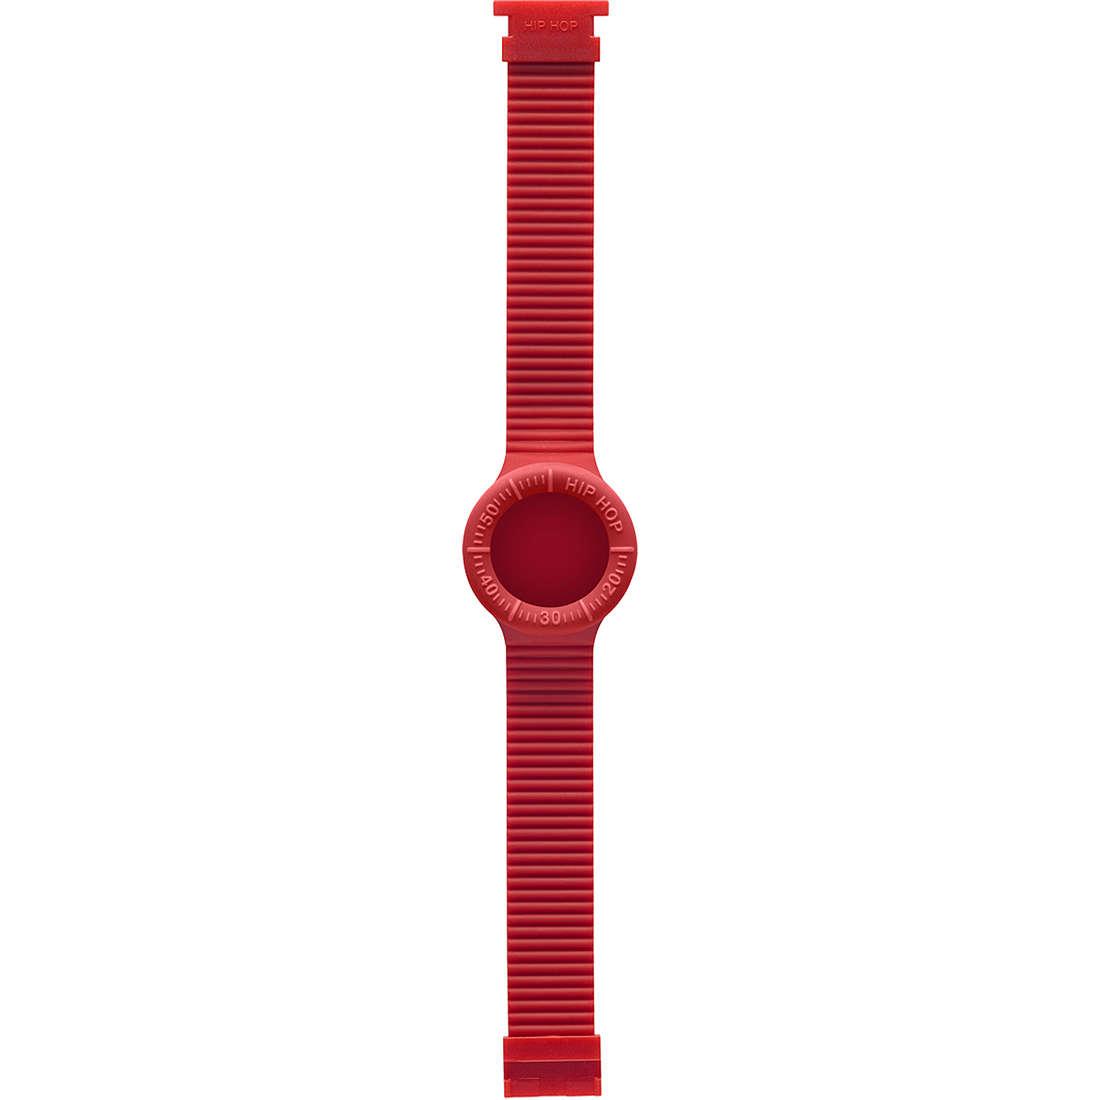 orologio accessorio unisex Hip Hop Hero HBU0133